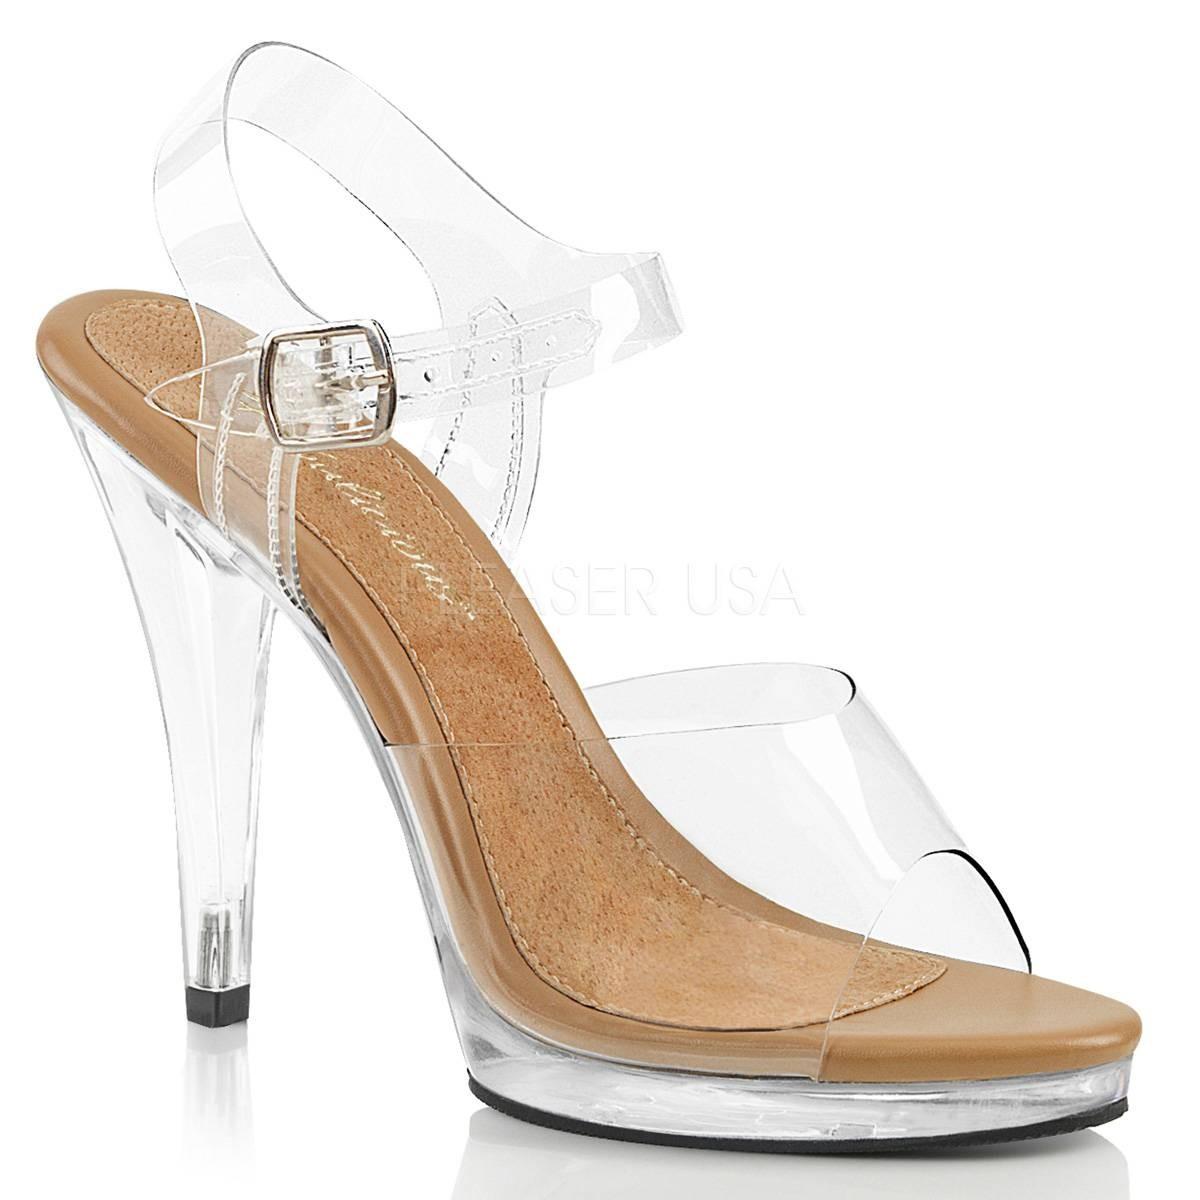 Sandalen - FLAIR 408 ° Damen Sandalette ° TransparentMatt ° Fabulicious  - Onlineshop RedSixty